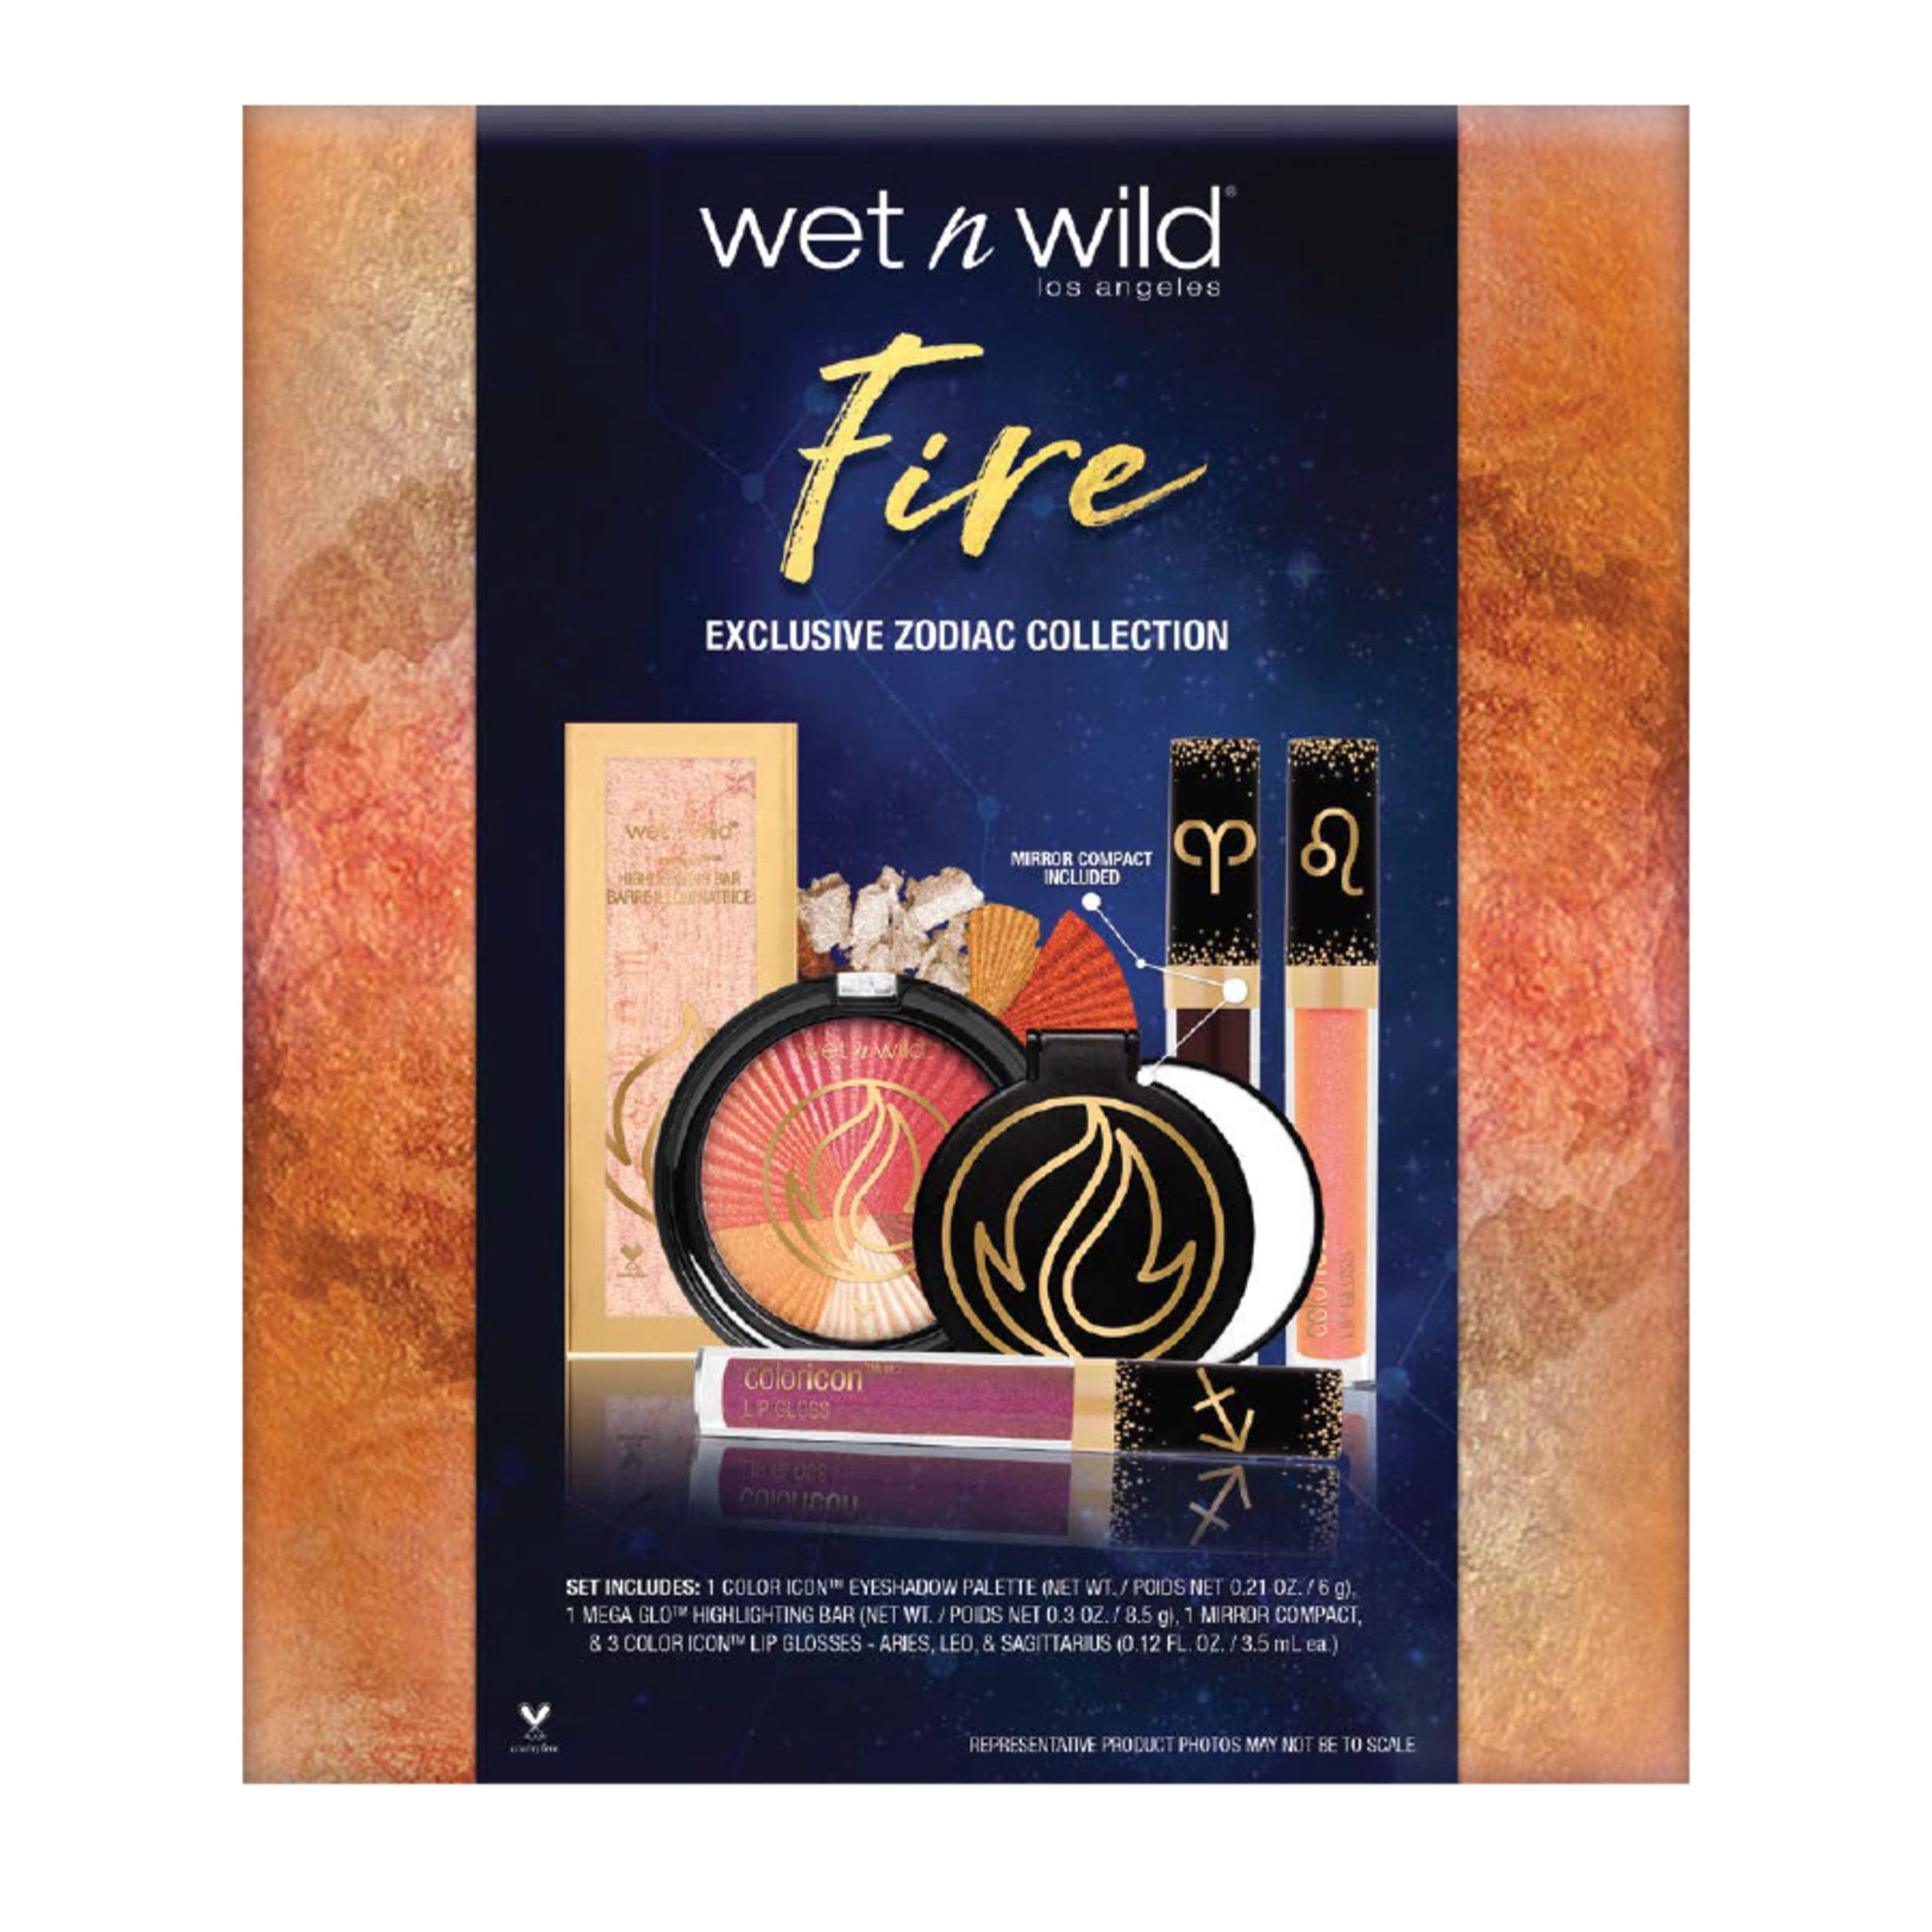 wet n wild Zodiac Makeup Value Set, Fire ($21 88 Value)